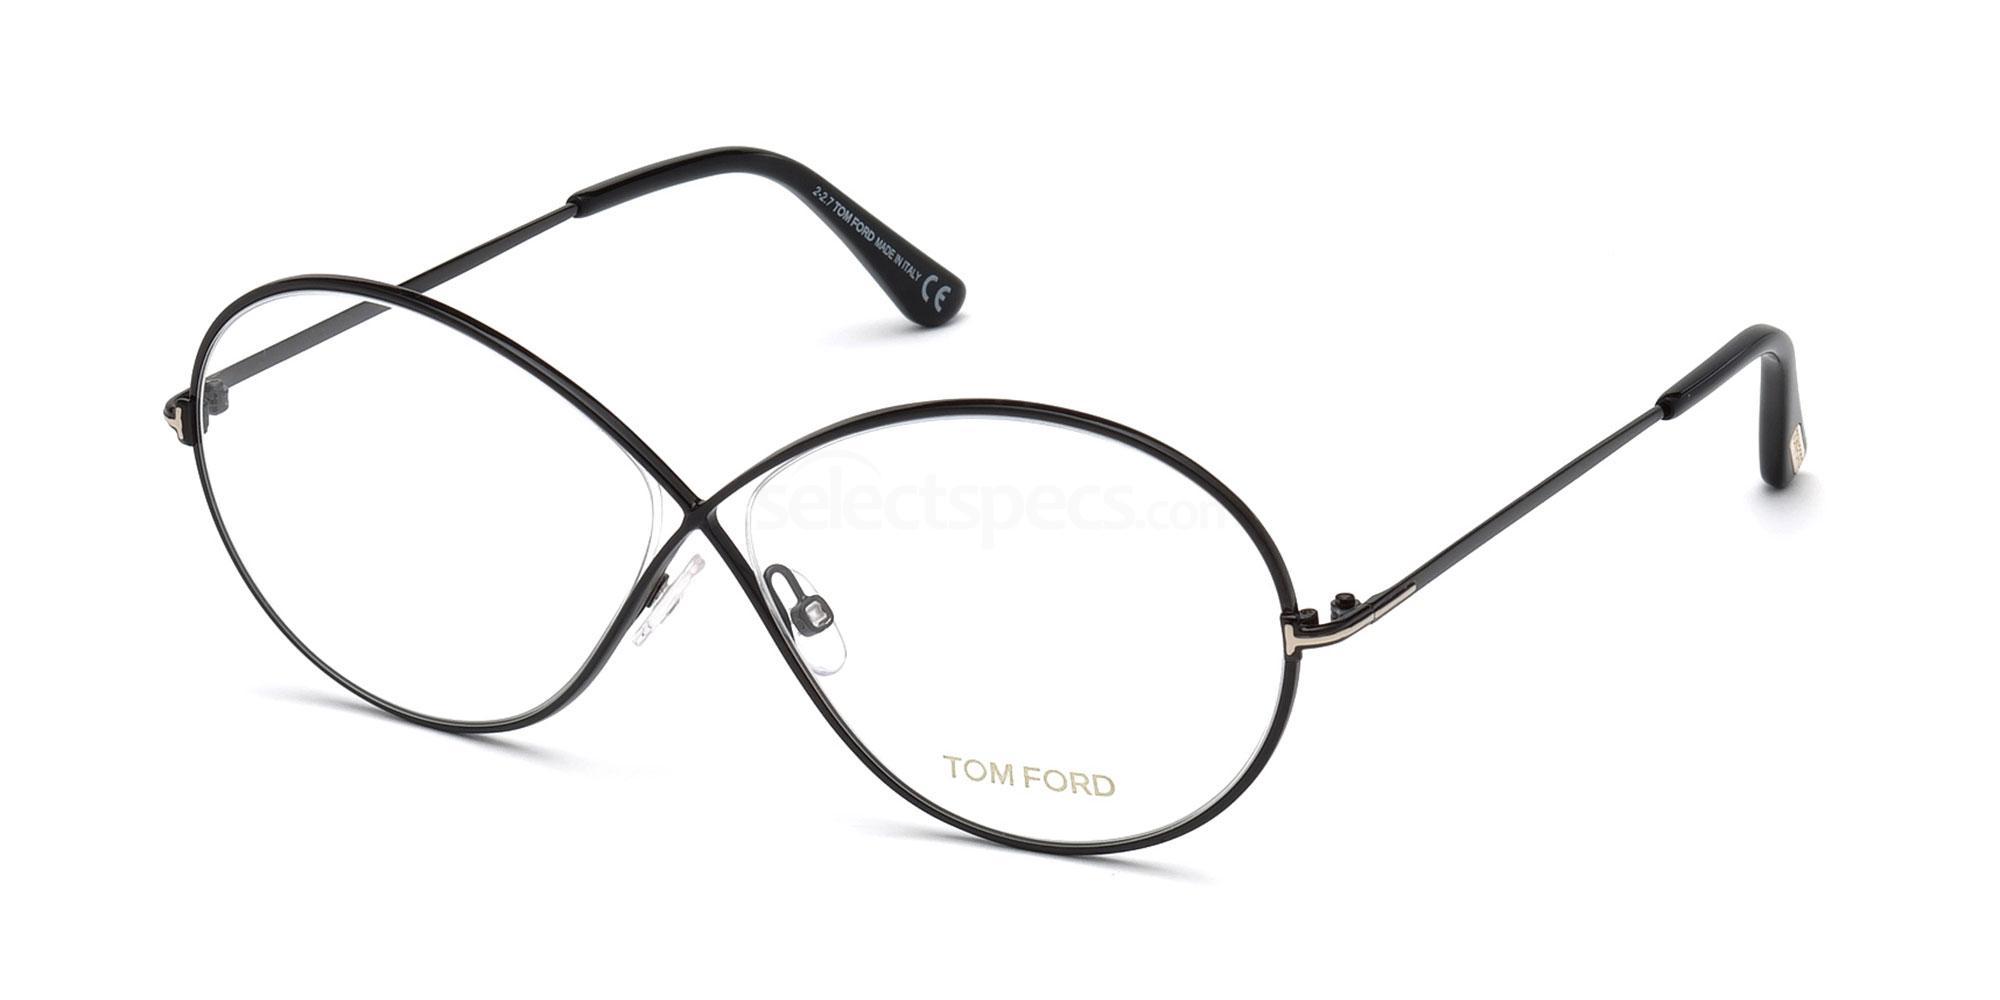 Tom Ford prescription glasses infinity style frame